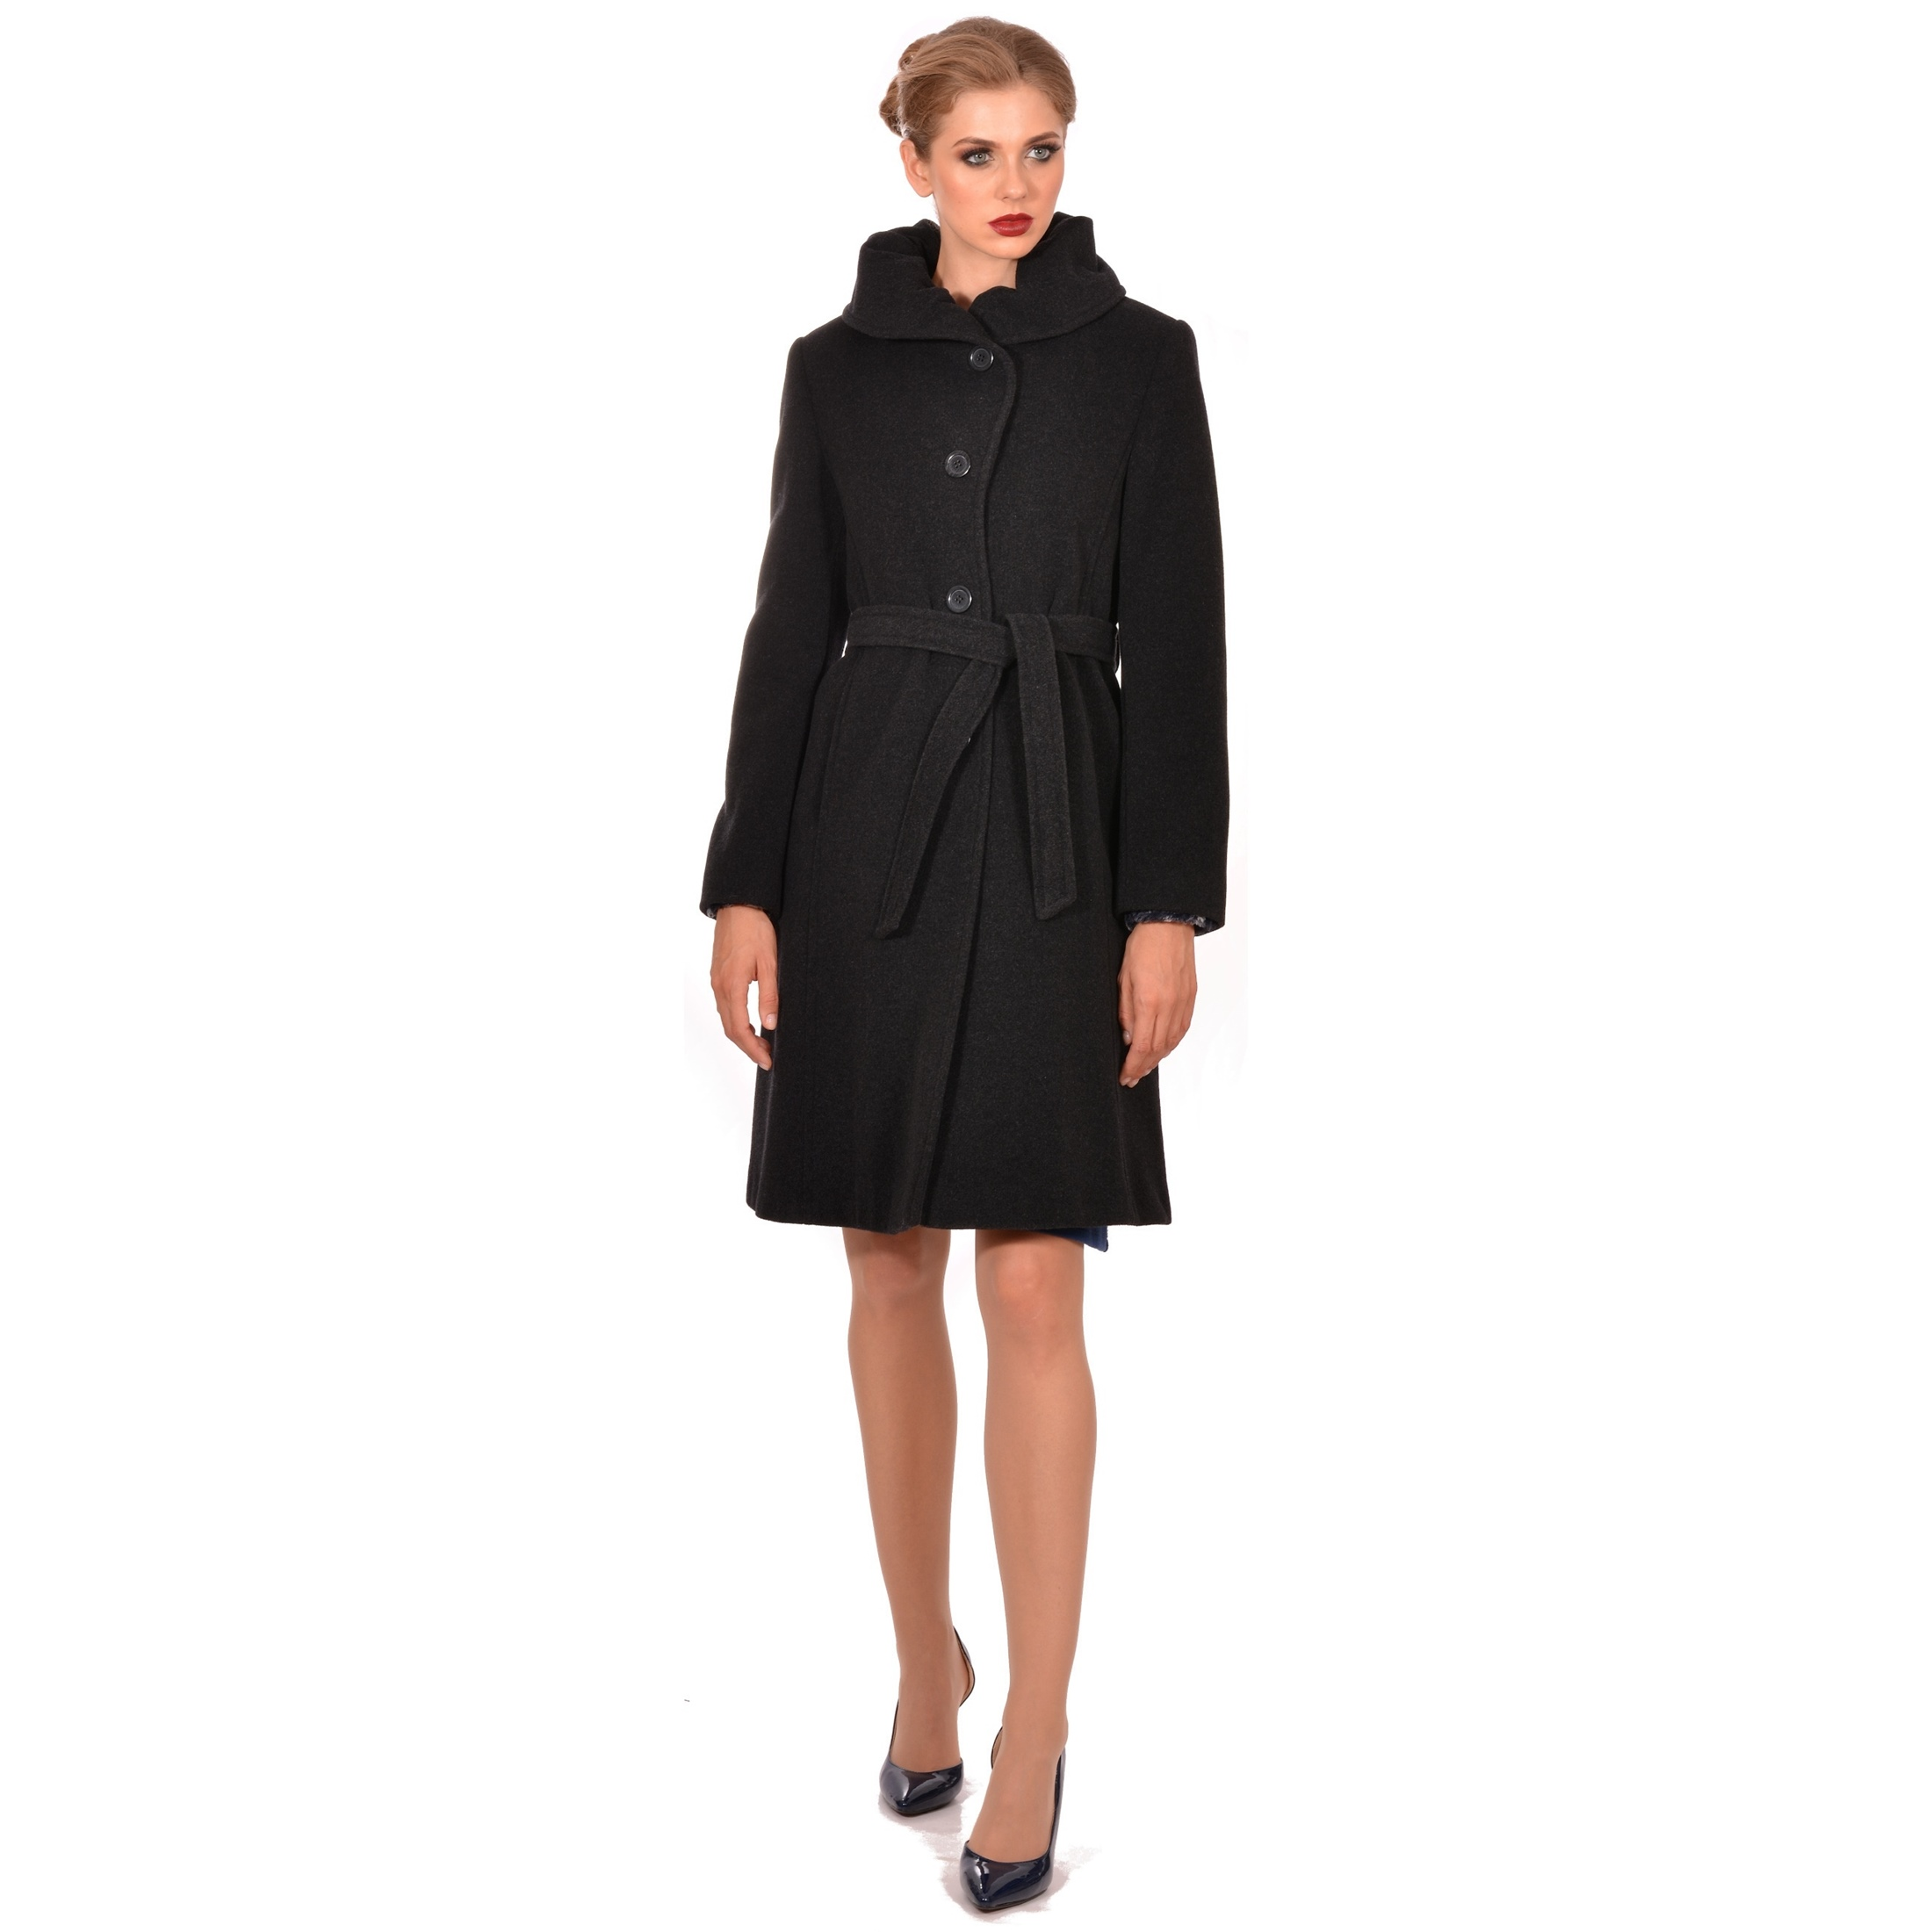 ženski kaput crni lady m, women's coat black woolen